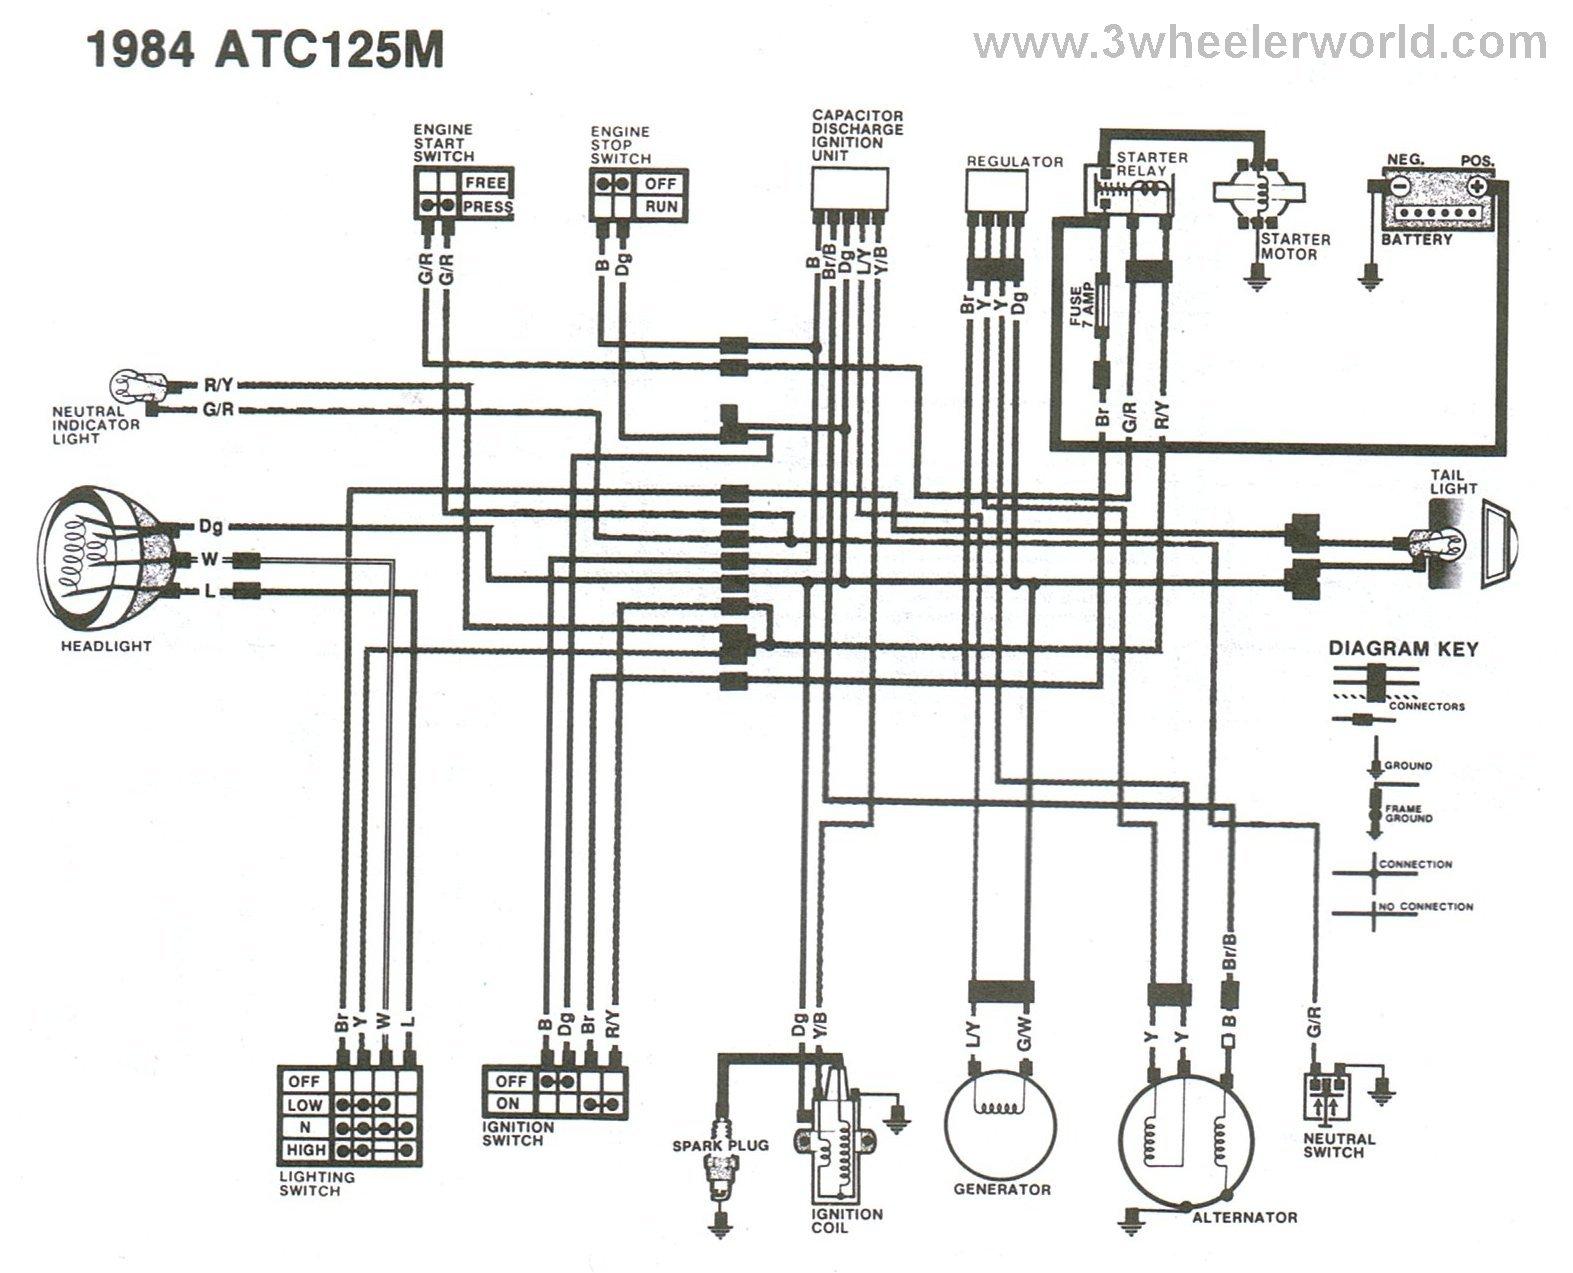 Rd 200 Wiring Diagram Yamaha Ls Diagrams And Roadstar Caravan Honda Trx Image Auto Schematic On